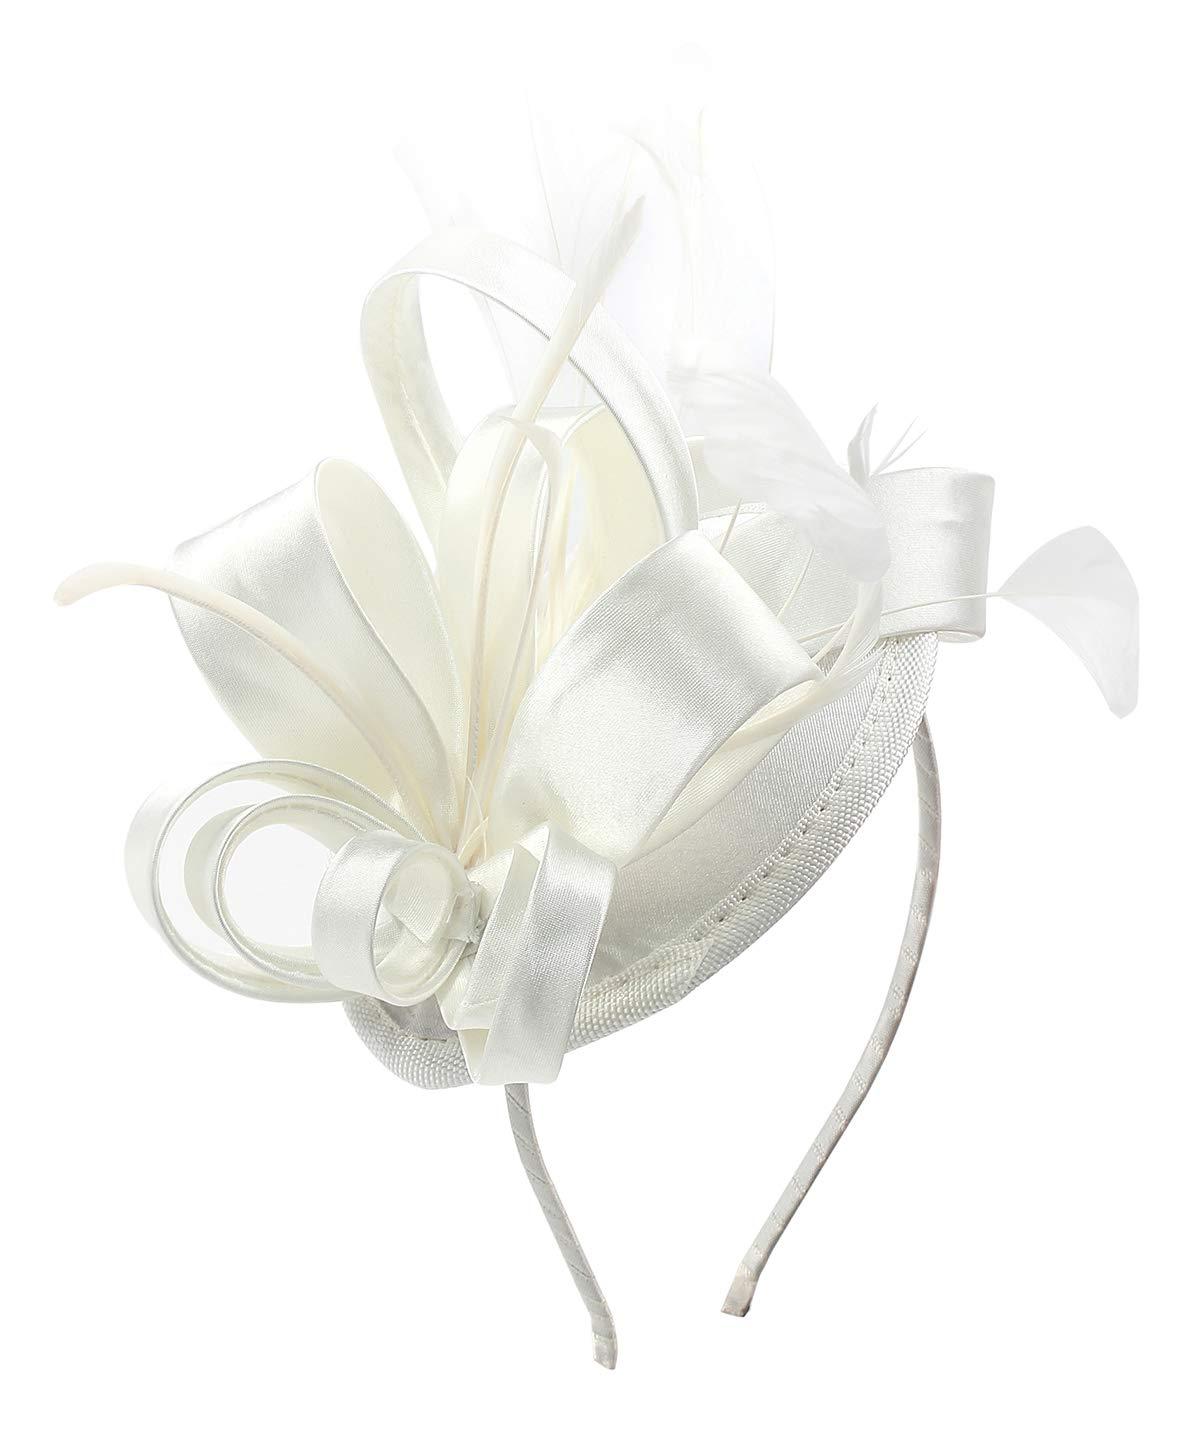 Felizhouse 1920s Fascinators For Women Feathers Flapper Headband Wedding Royal Ascot Racing Tea Party Head Piece